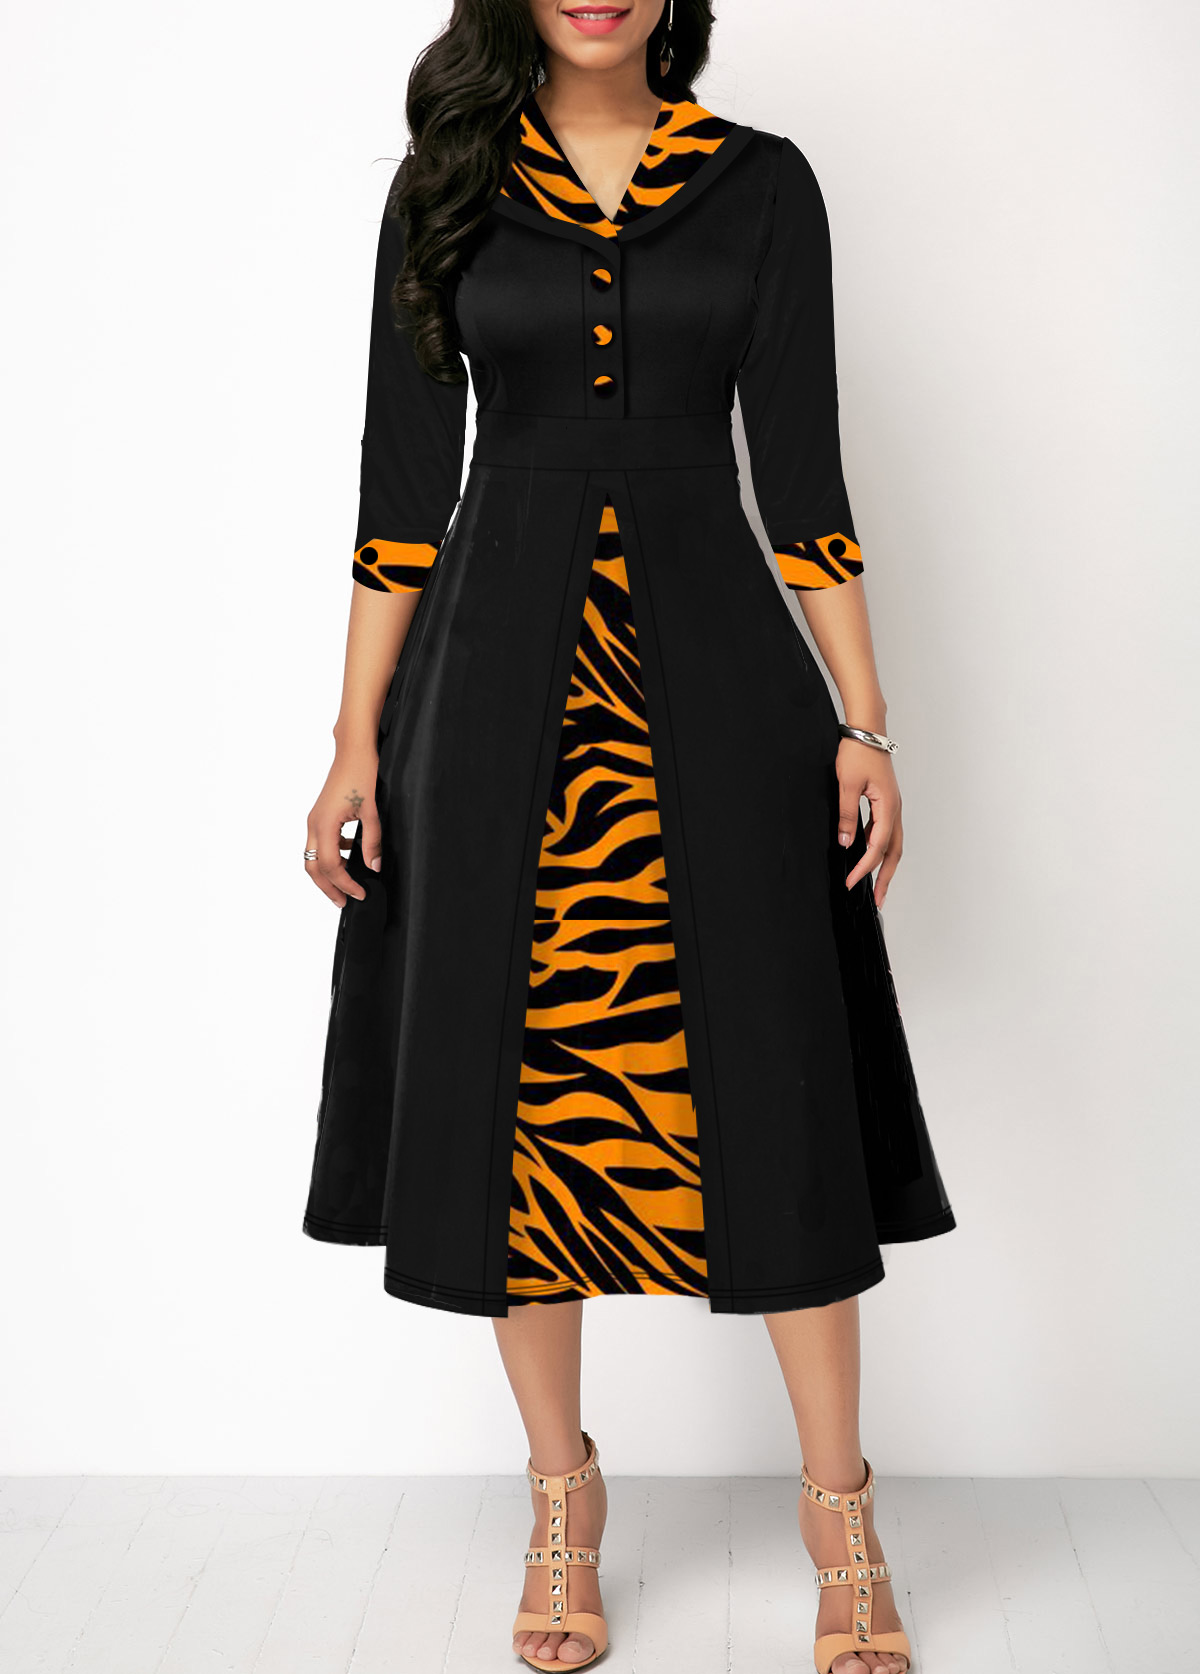 High Waist Zebra Print Three Quarter Sleeve Dress